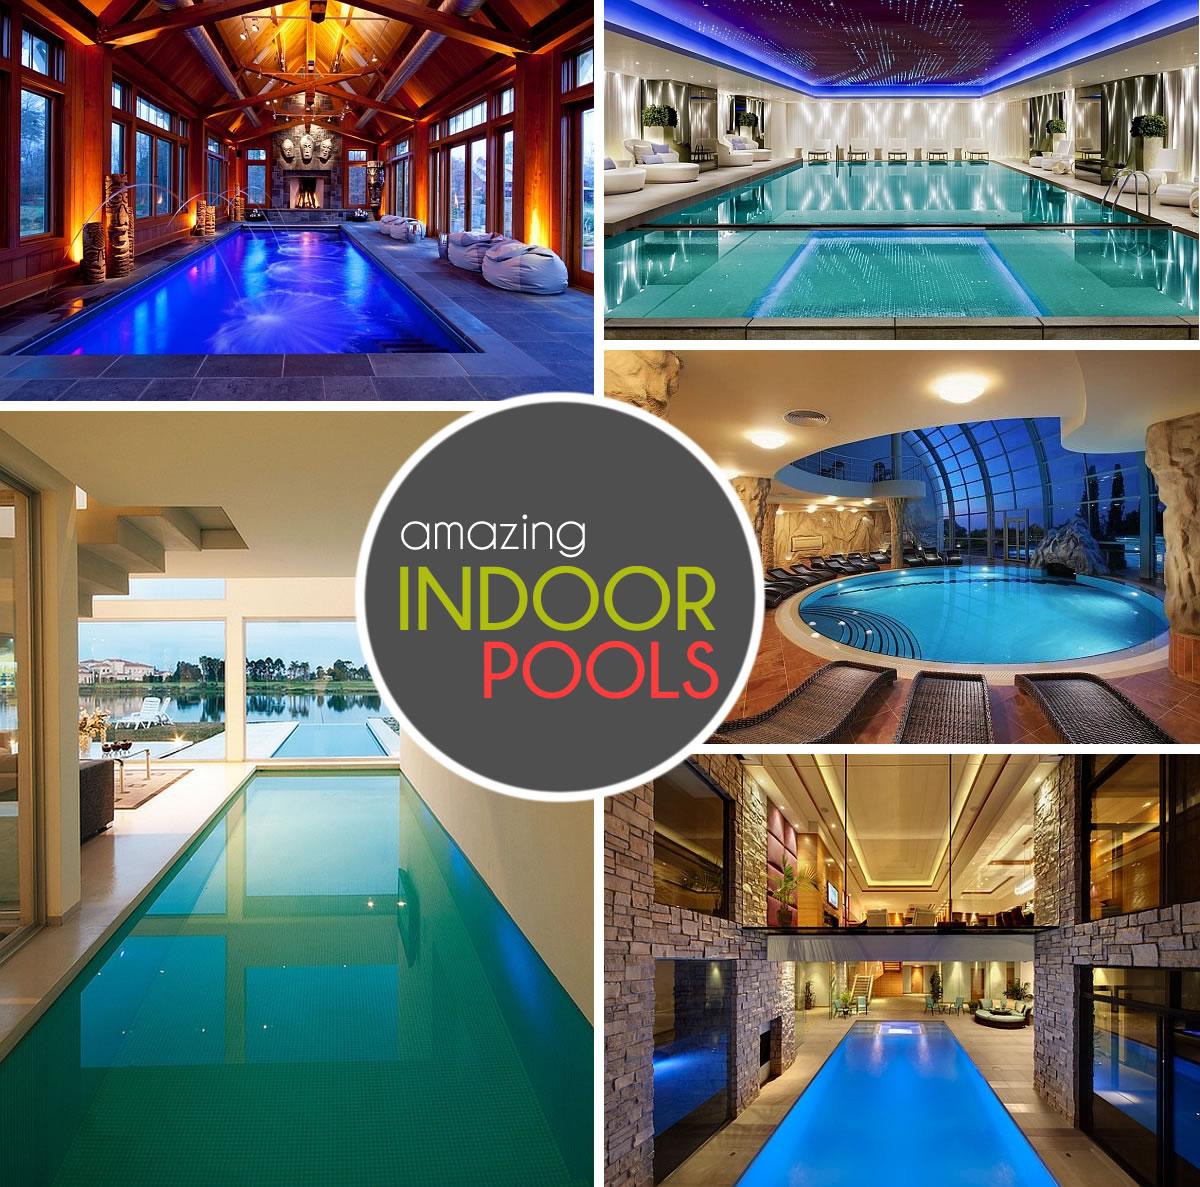 50 Amazing Indoor Swimming Pool Ideas